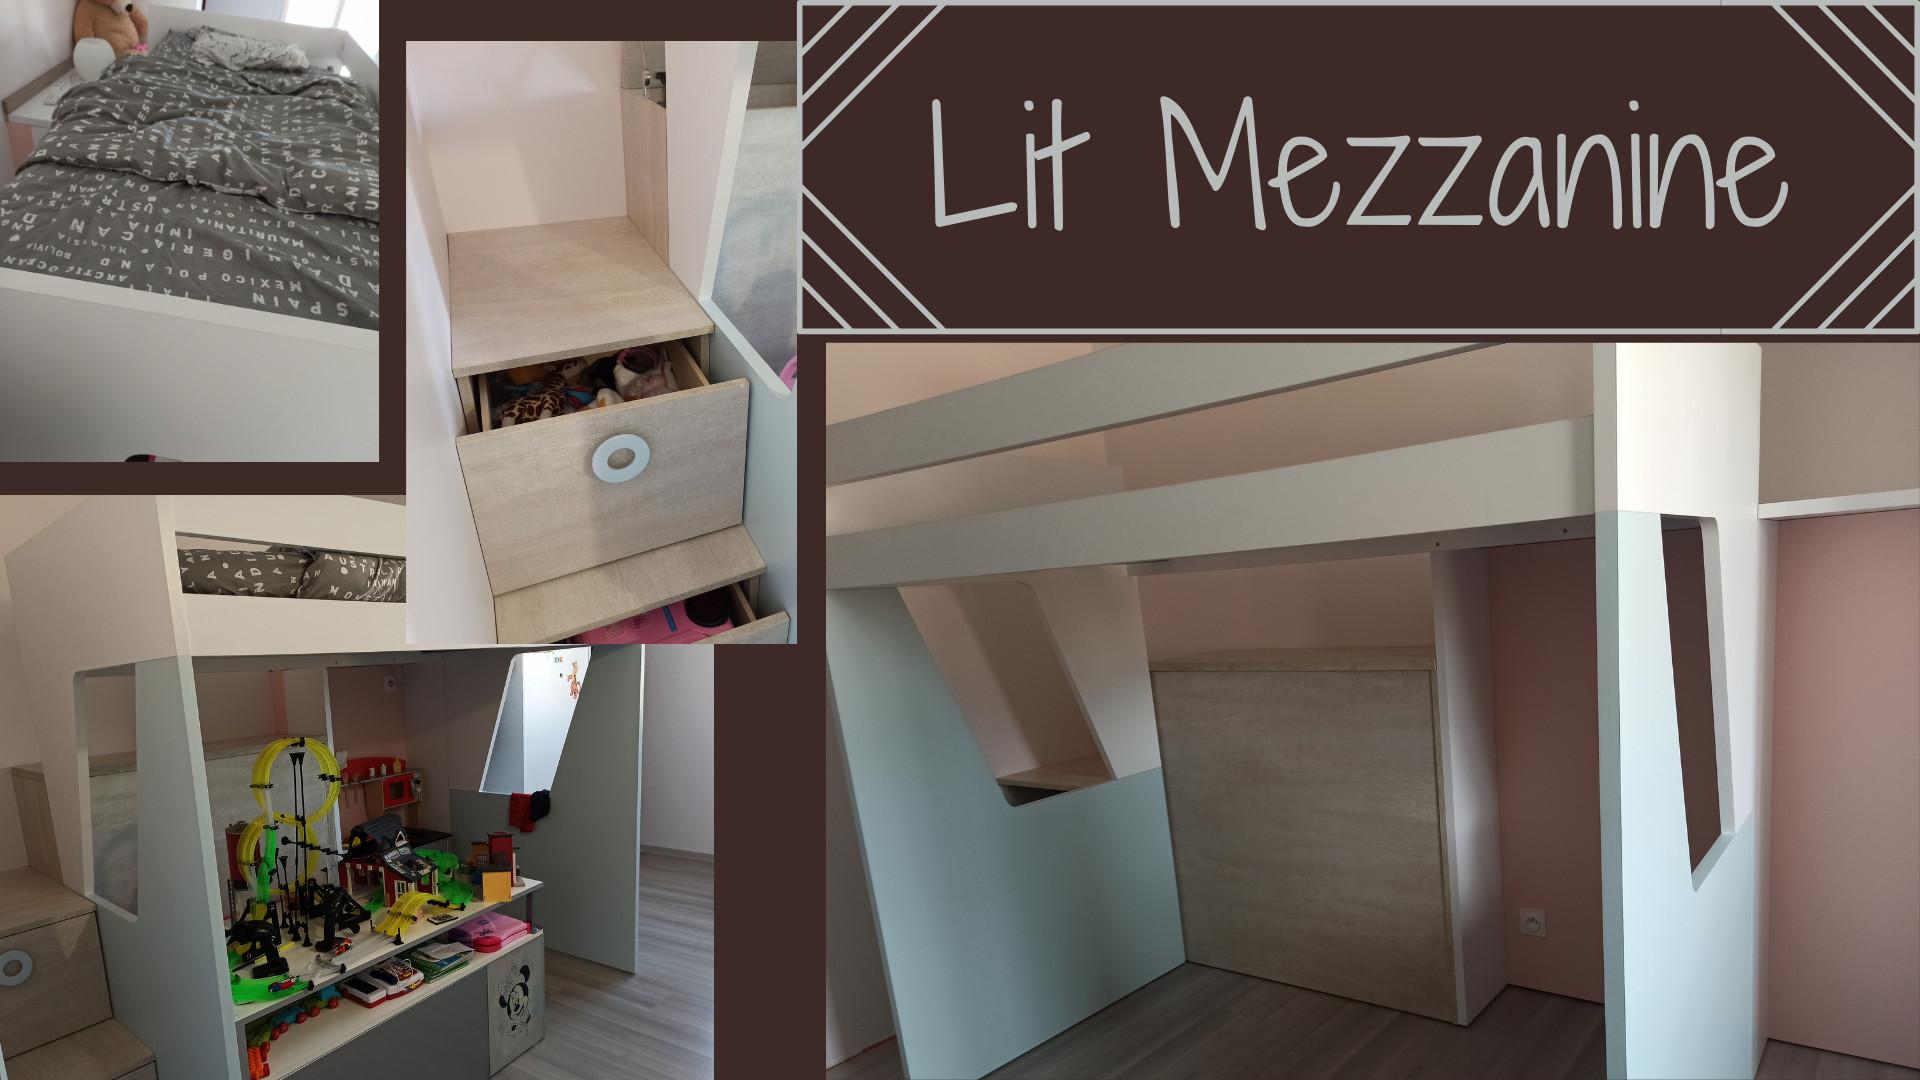 Astucieux lit mezzanine